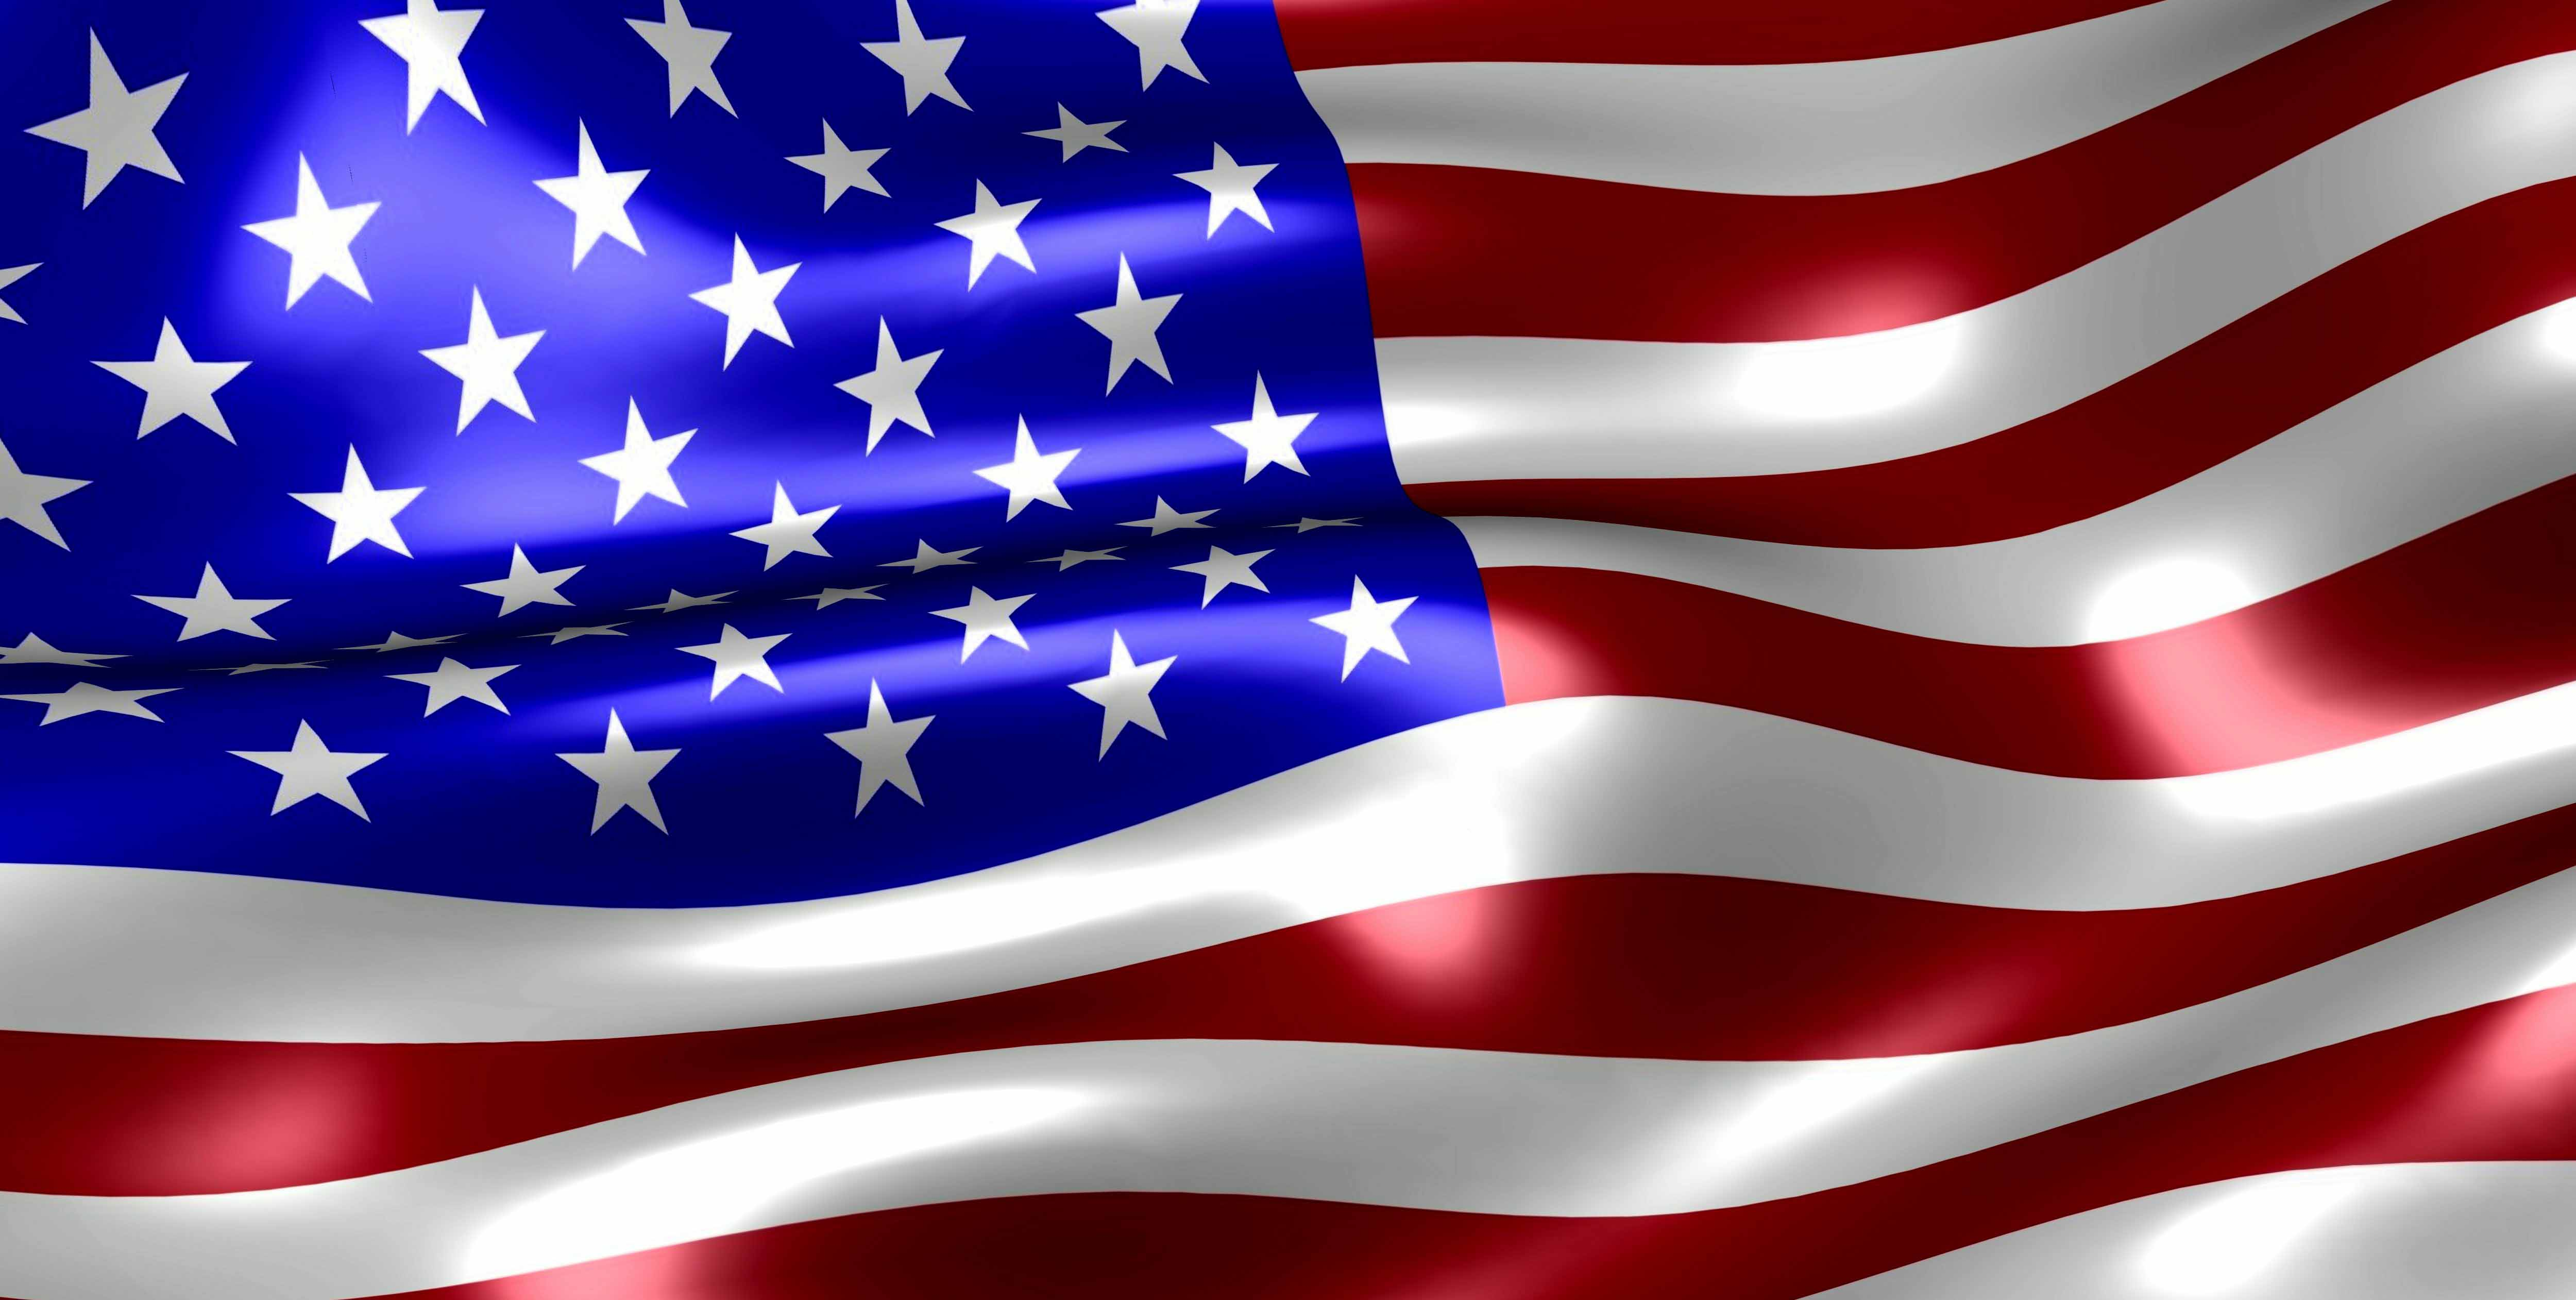 USA Flag Hd Wallpapers Download 5000x2523